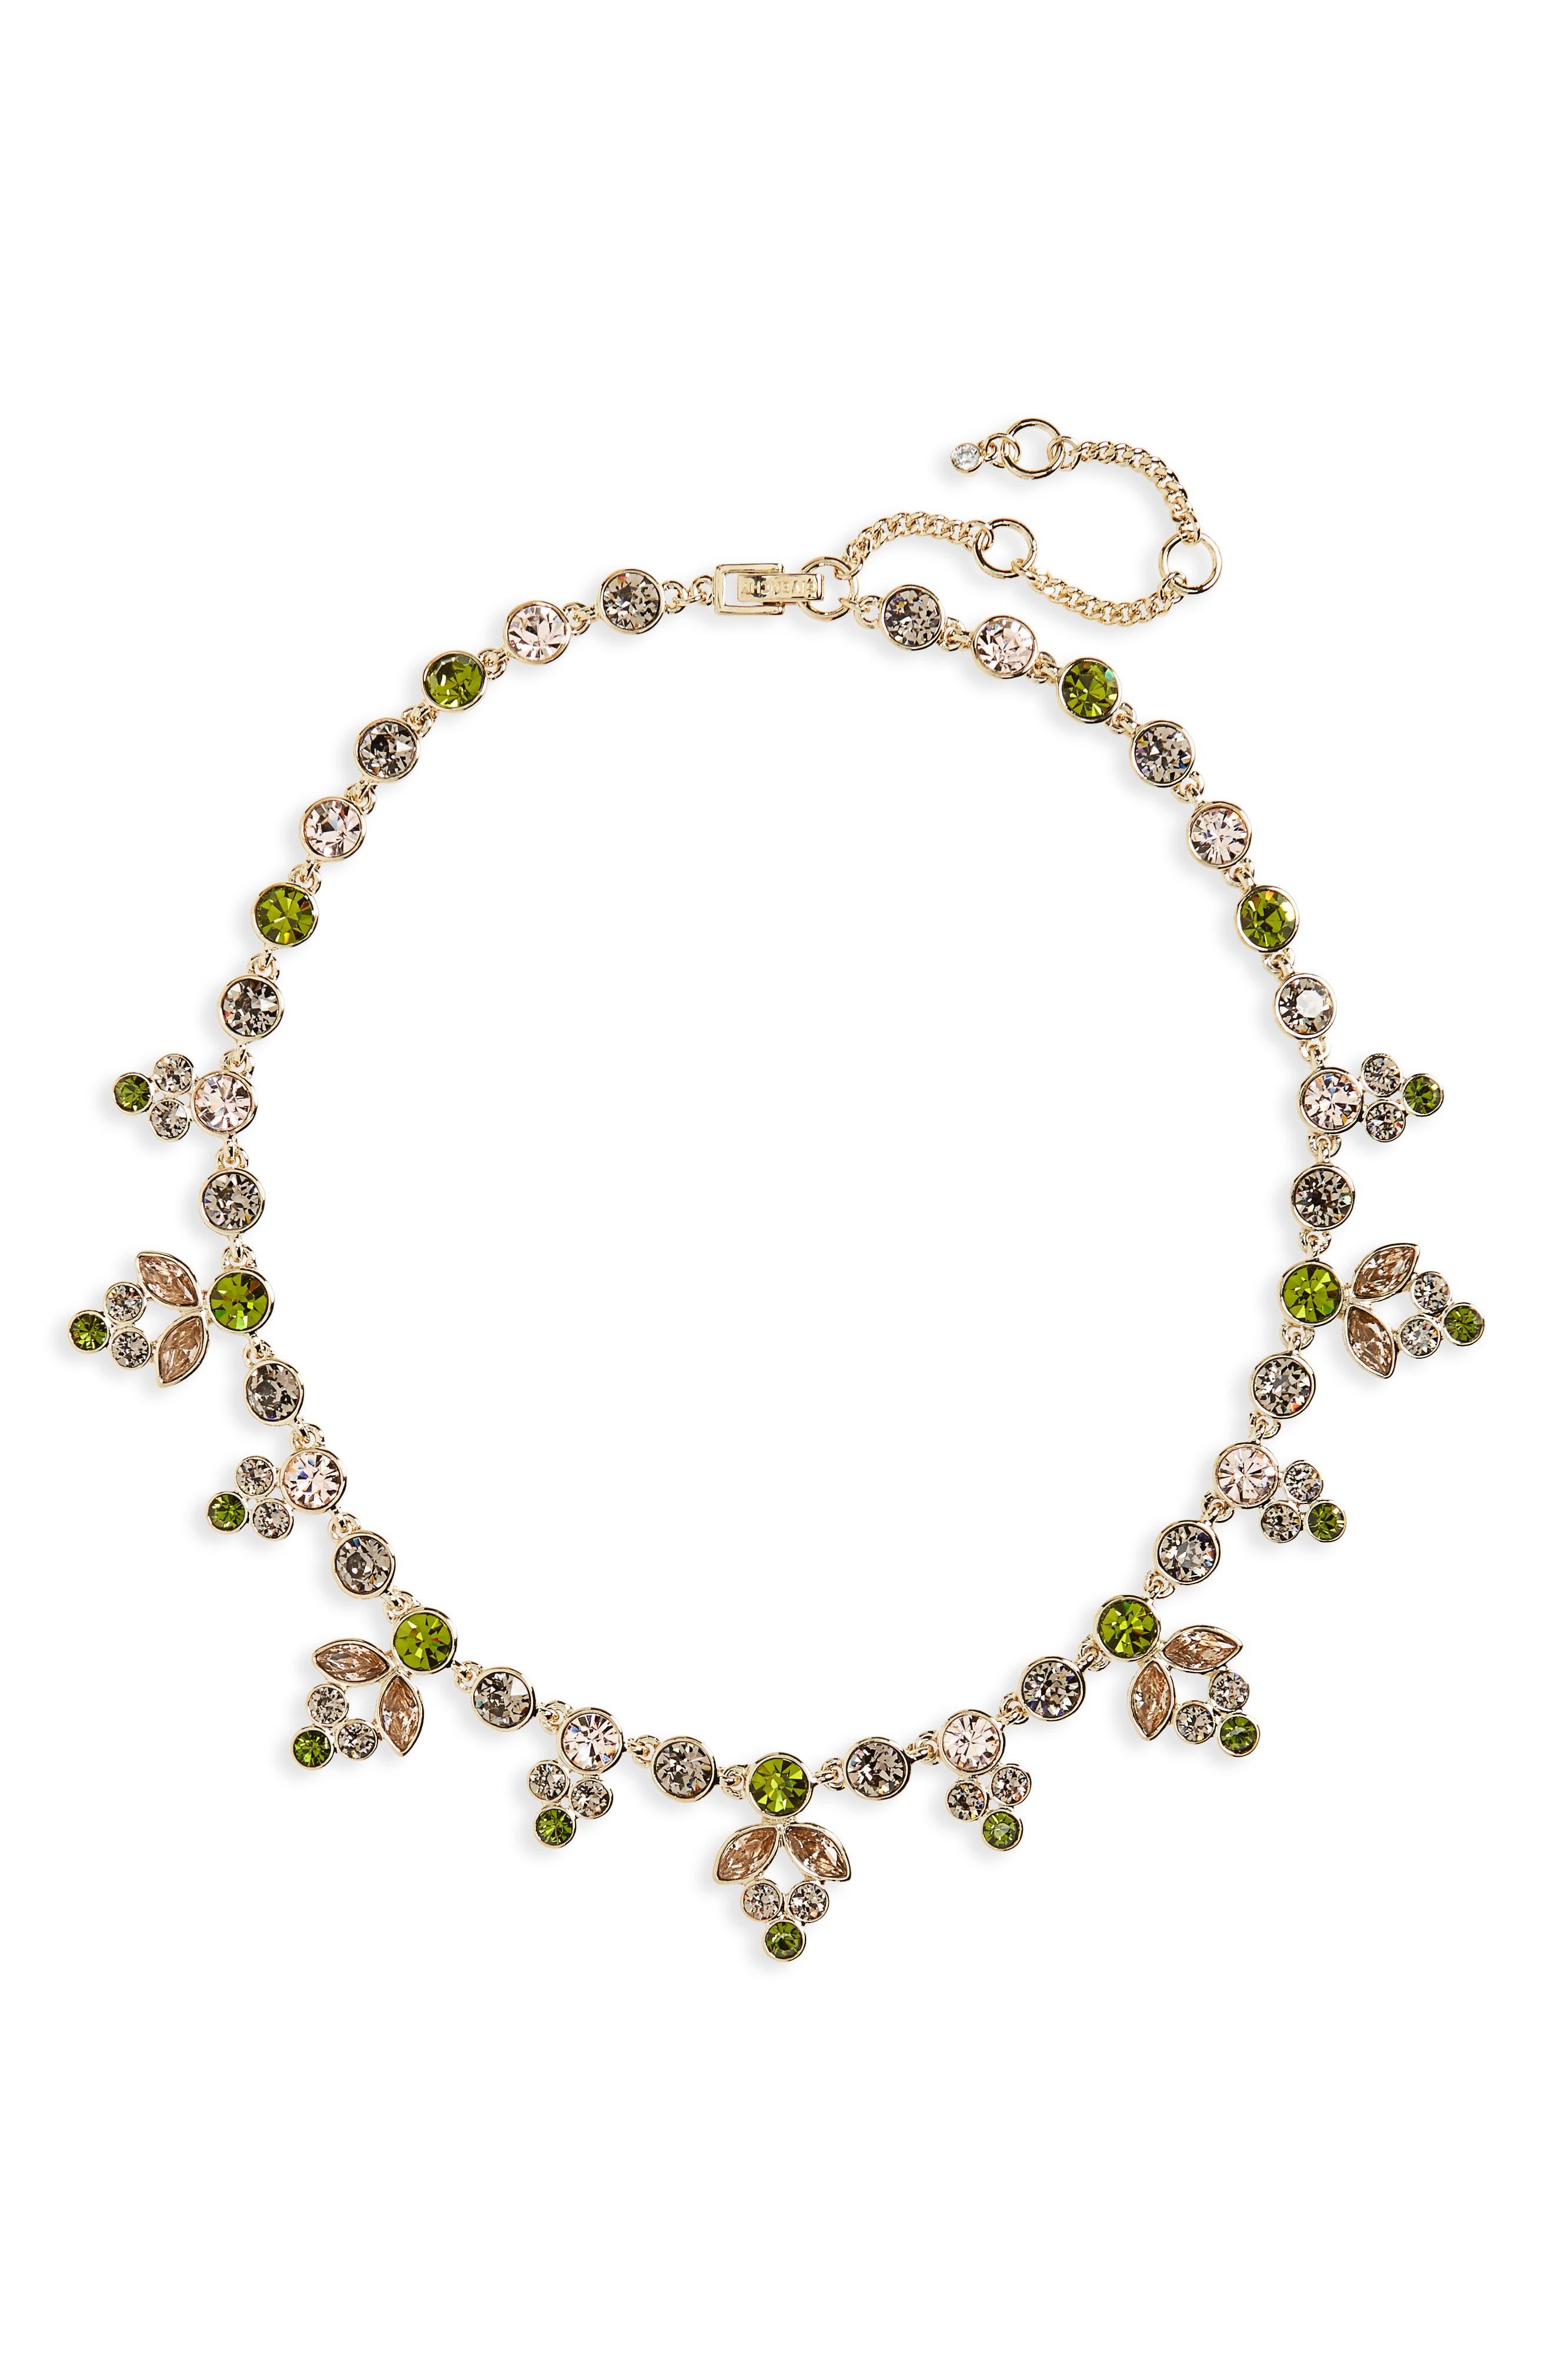 Givenchy Sydney Collar Necklace